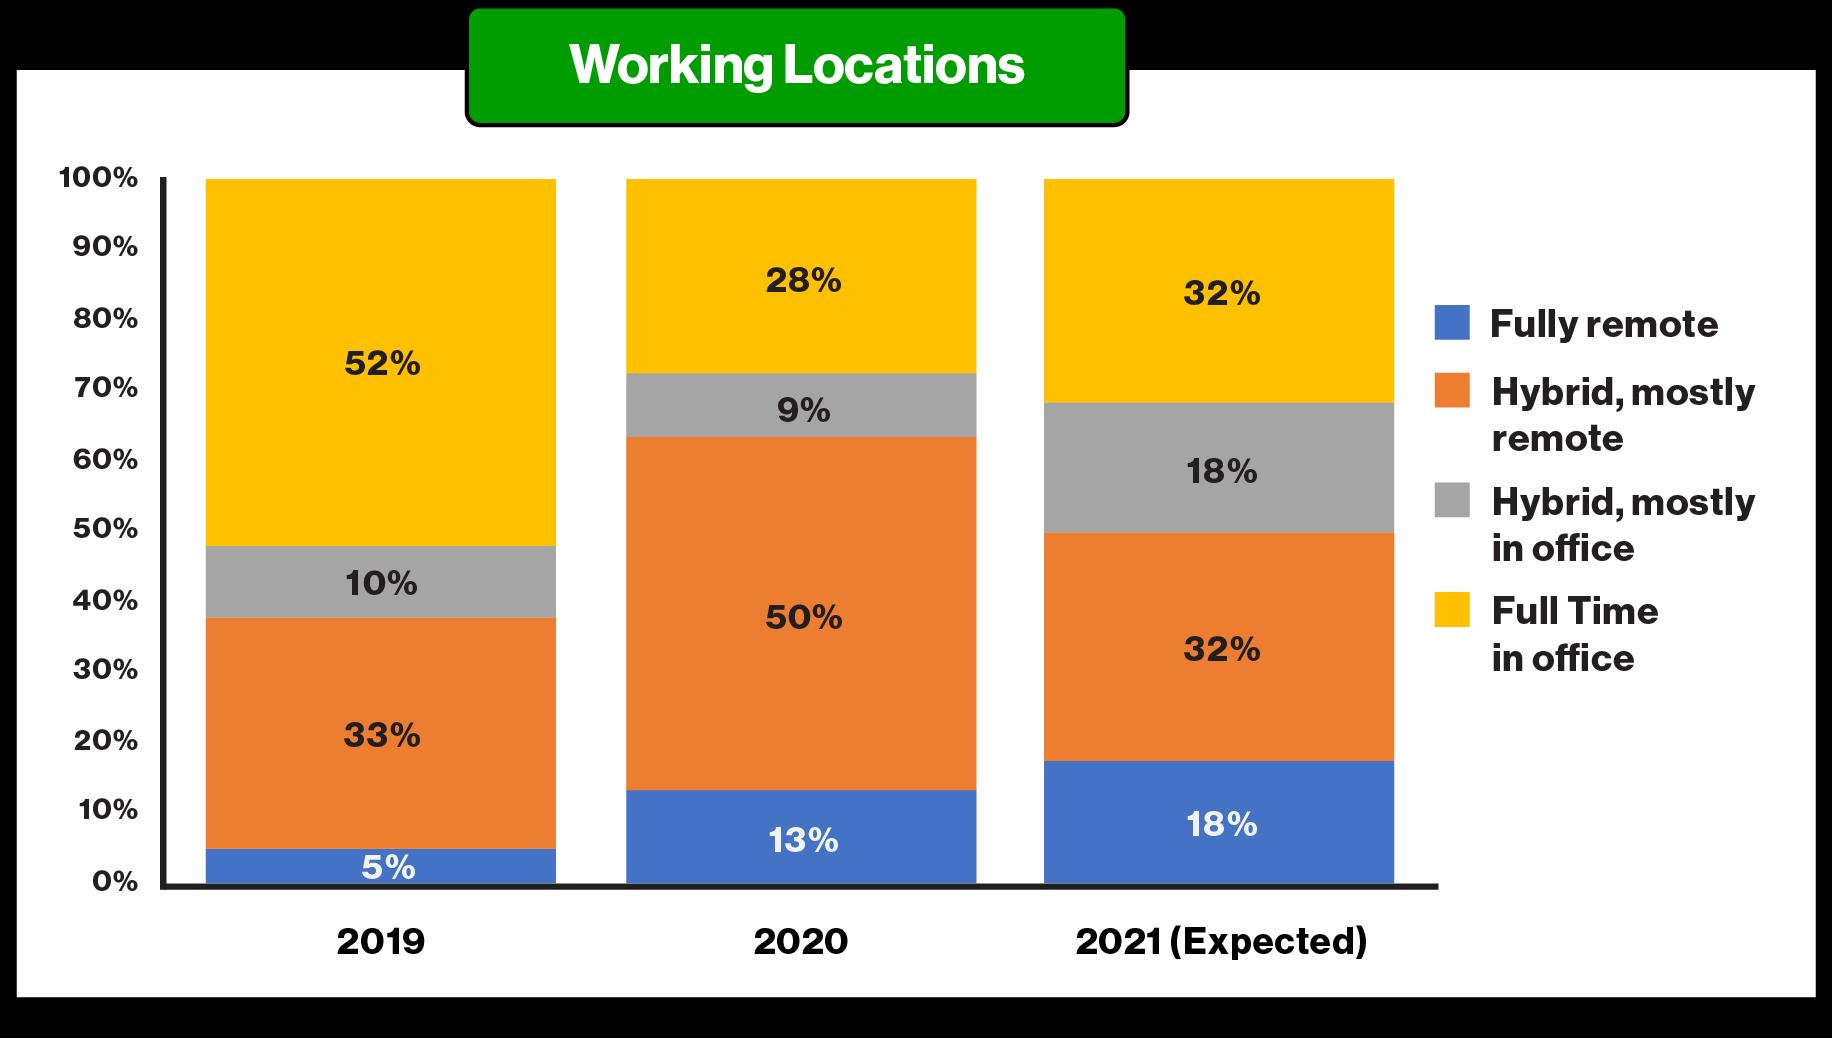 OVID Article JAN 2021_RemoteVsHybrid - ParkMobile